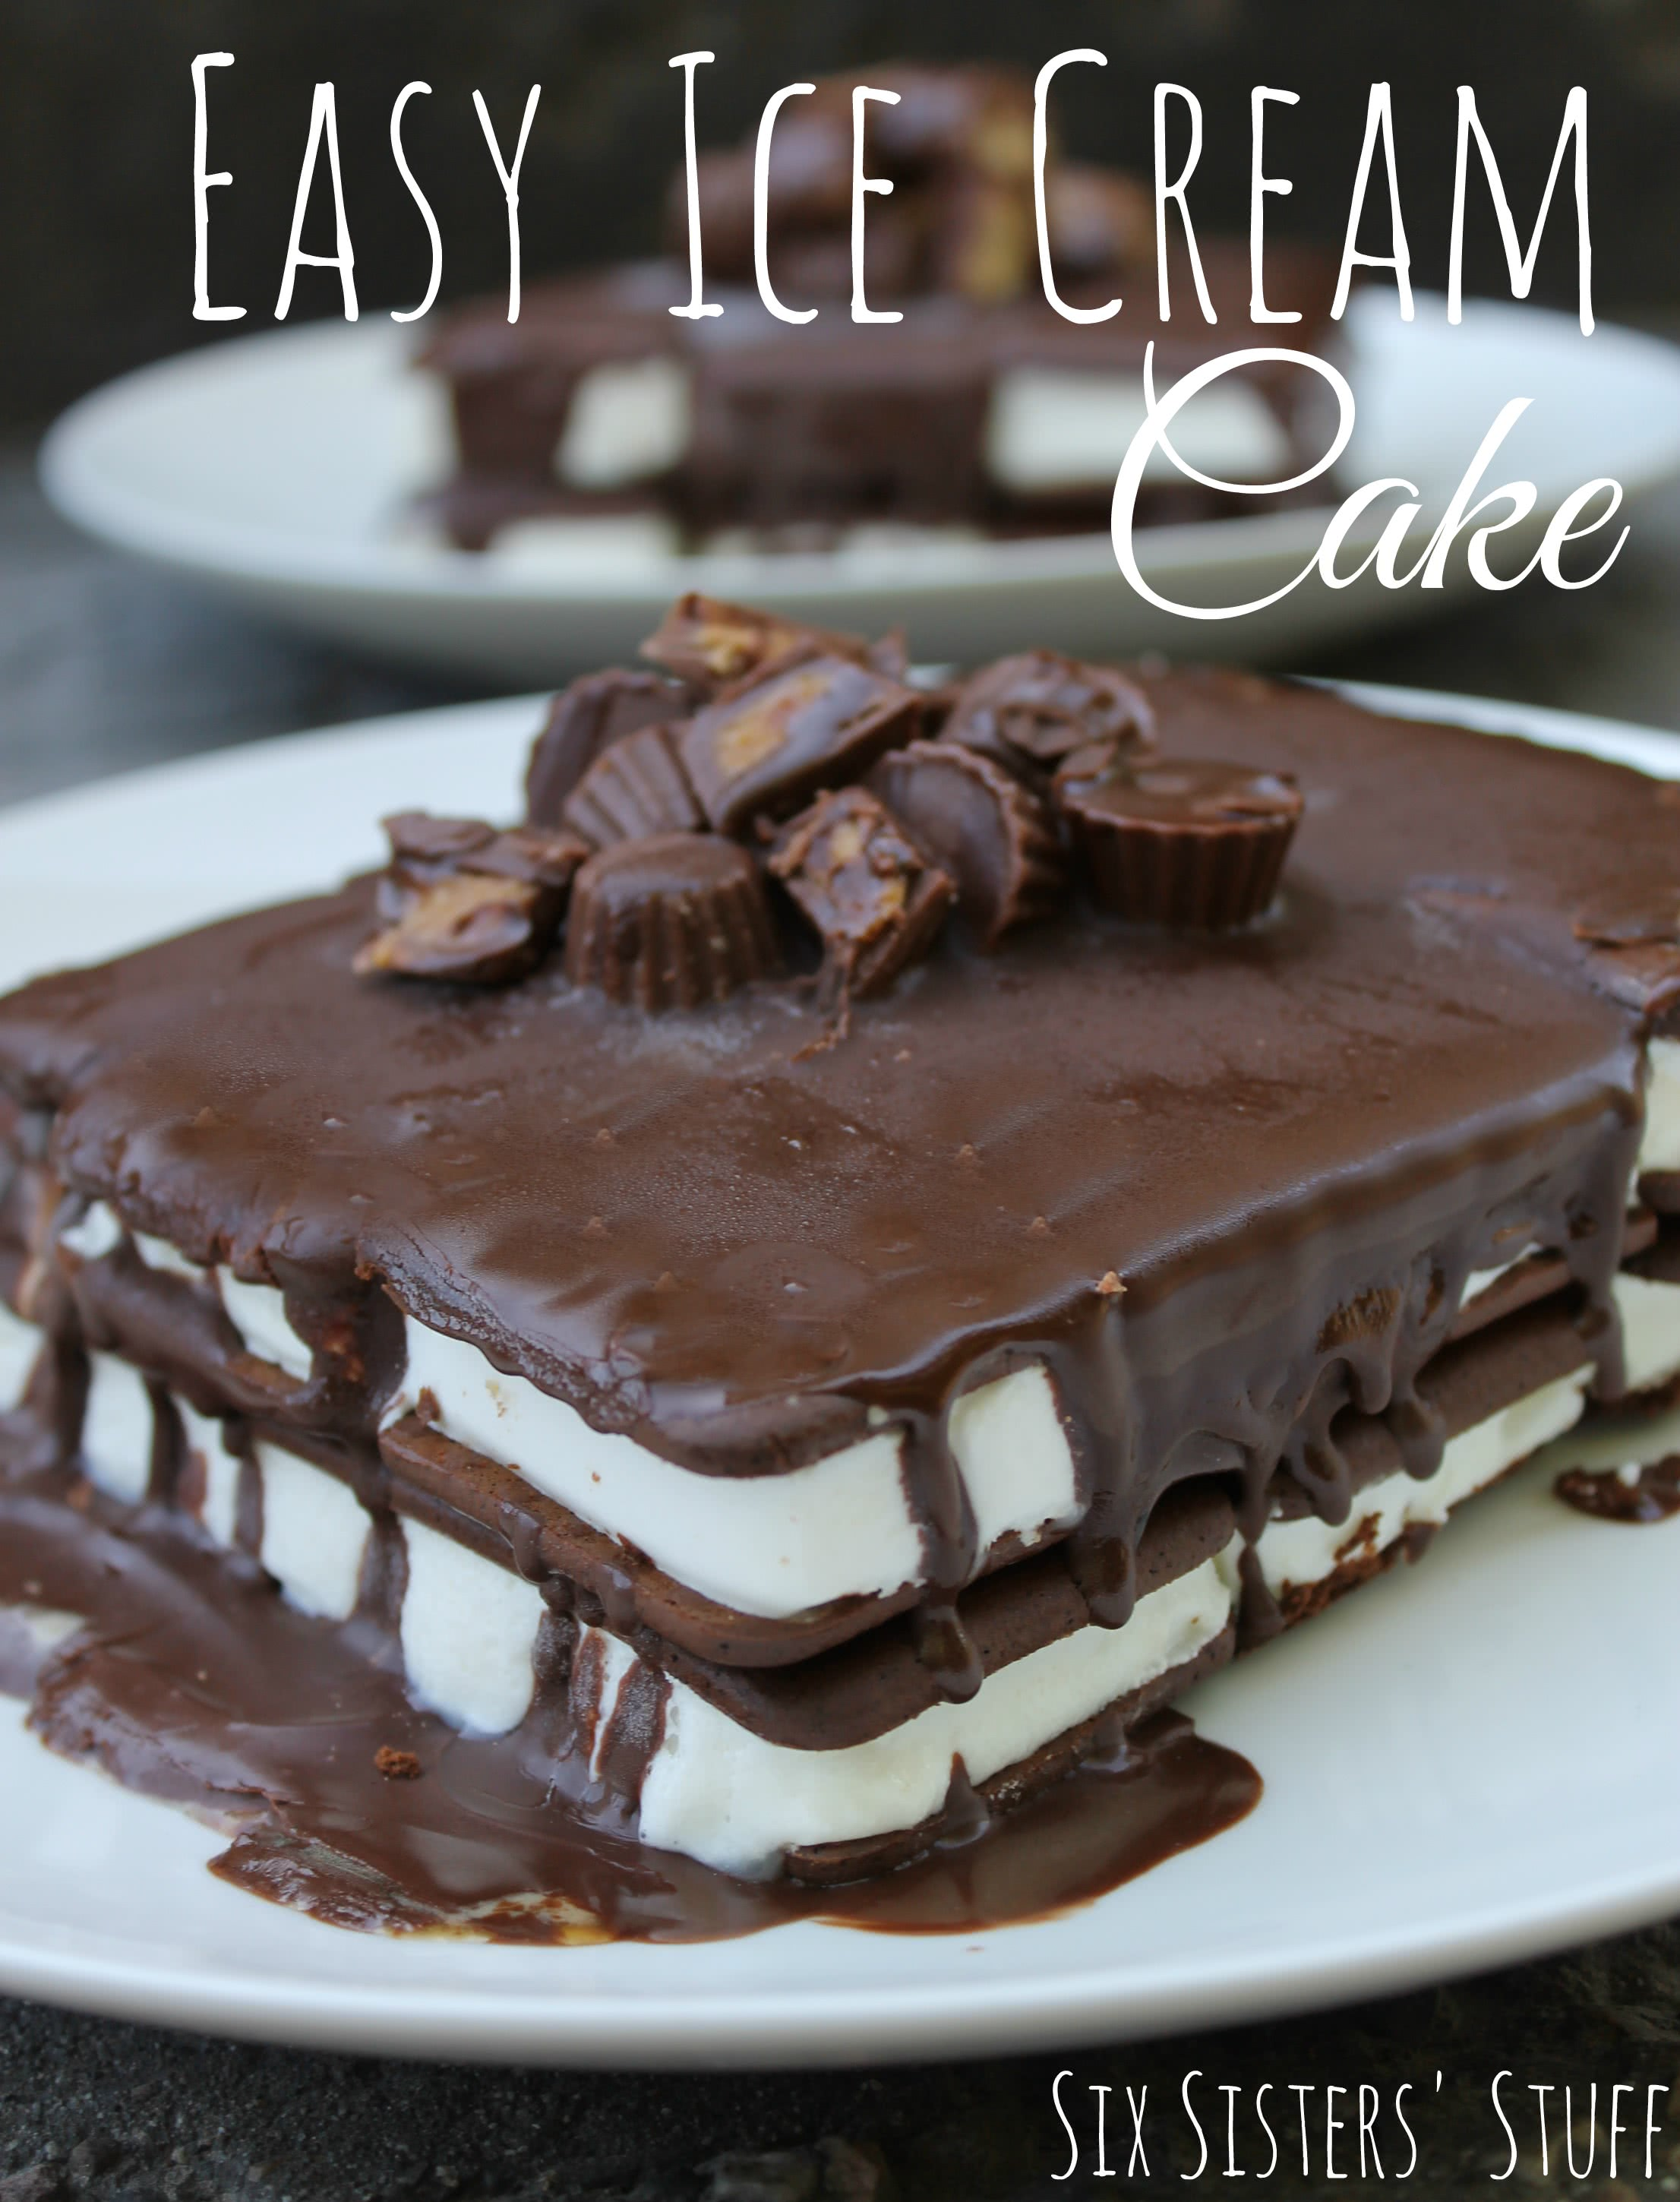 Iceceam cake 2